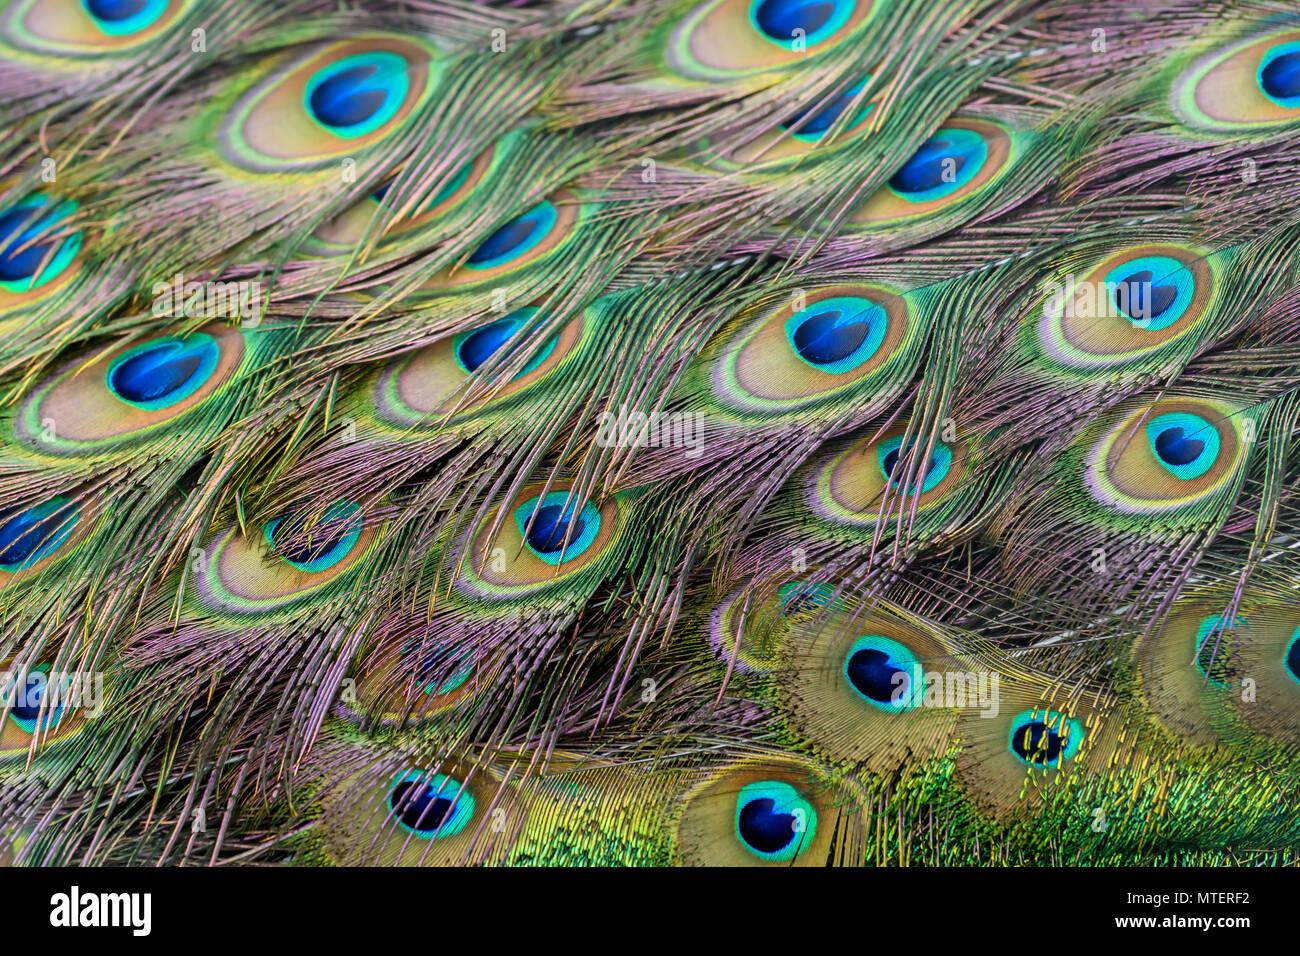 Peacock Feathers closeup - Stock Image